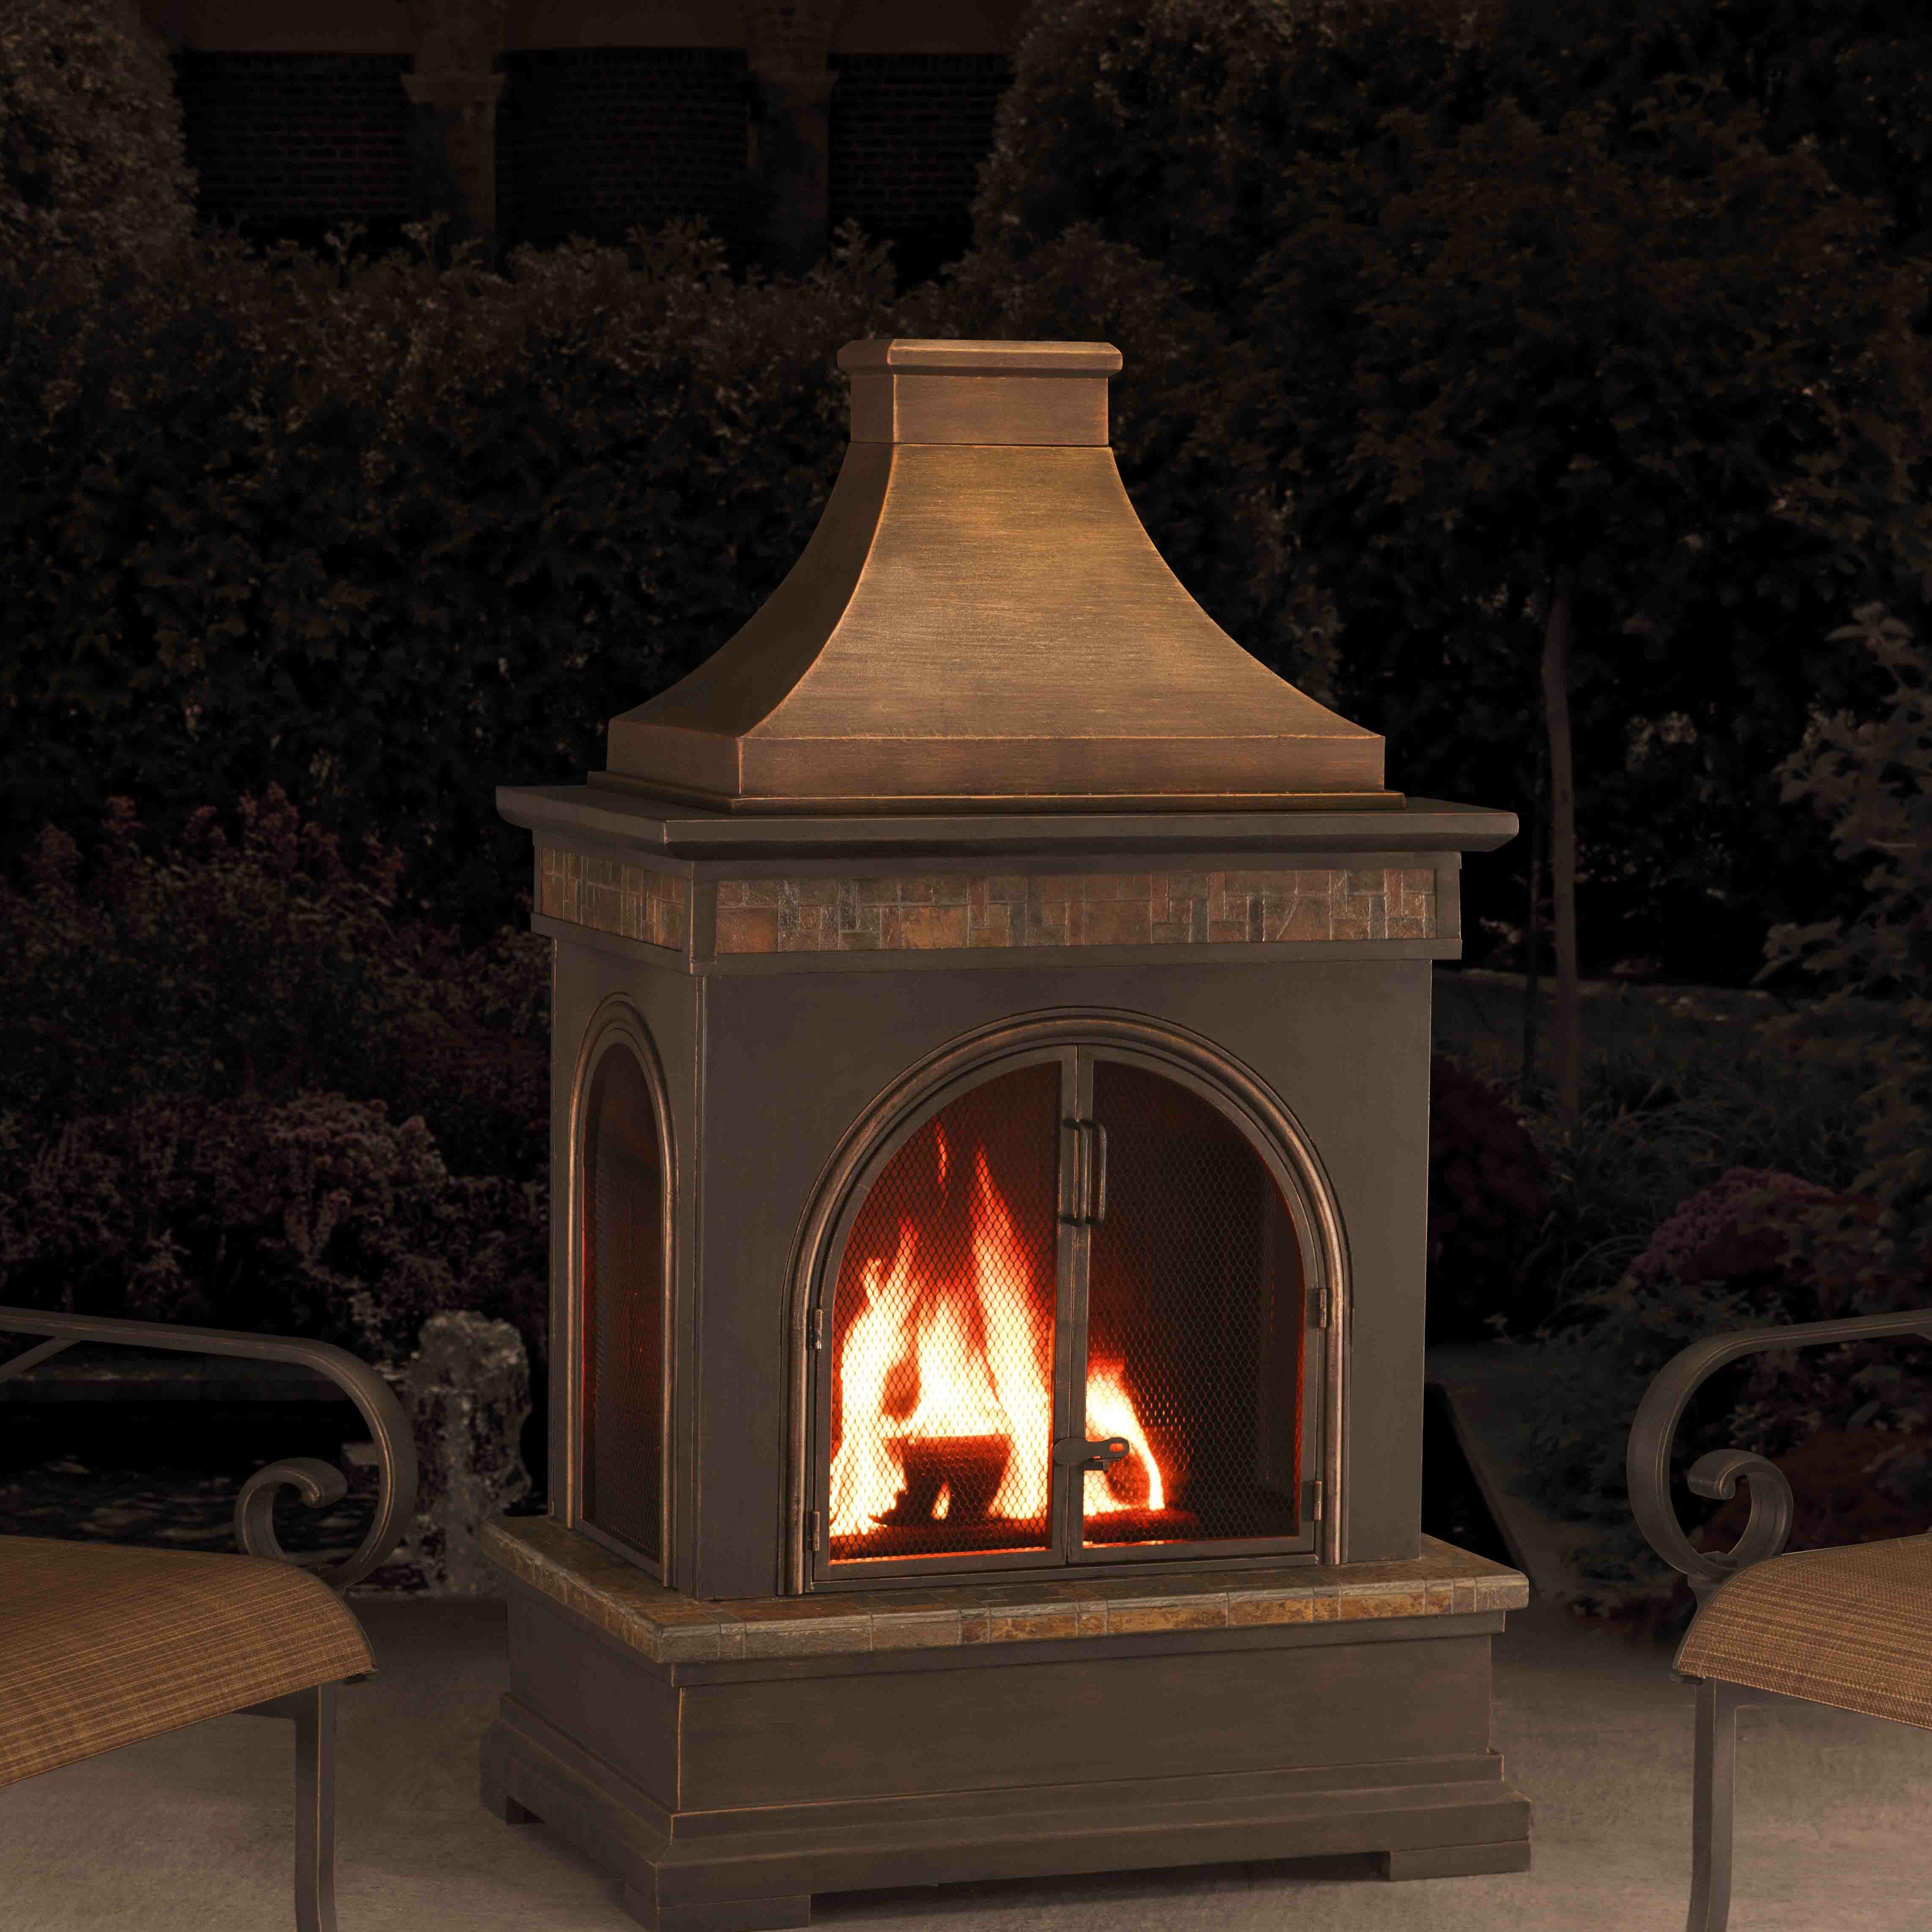 Sunjoy Hardy Slate And Steel Outdoor Fireplace Reviews Wayfair